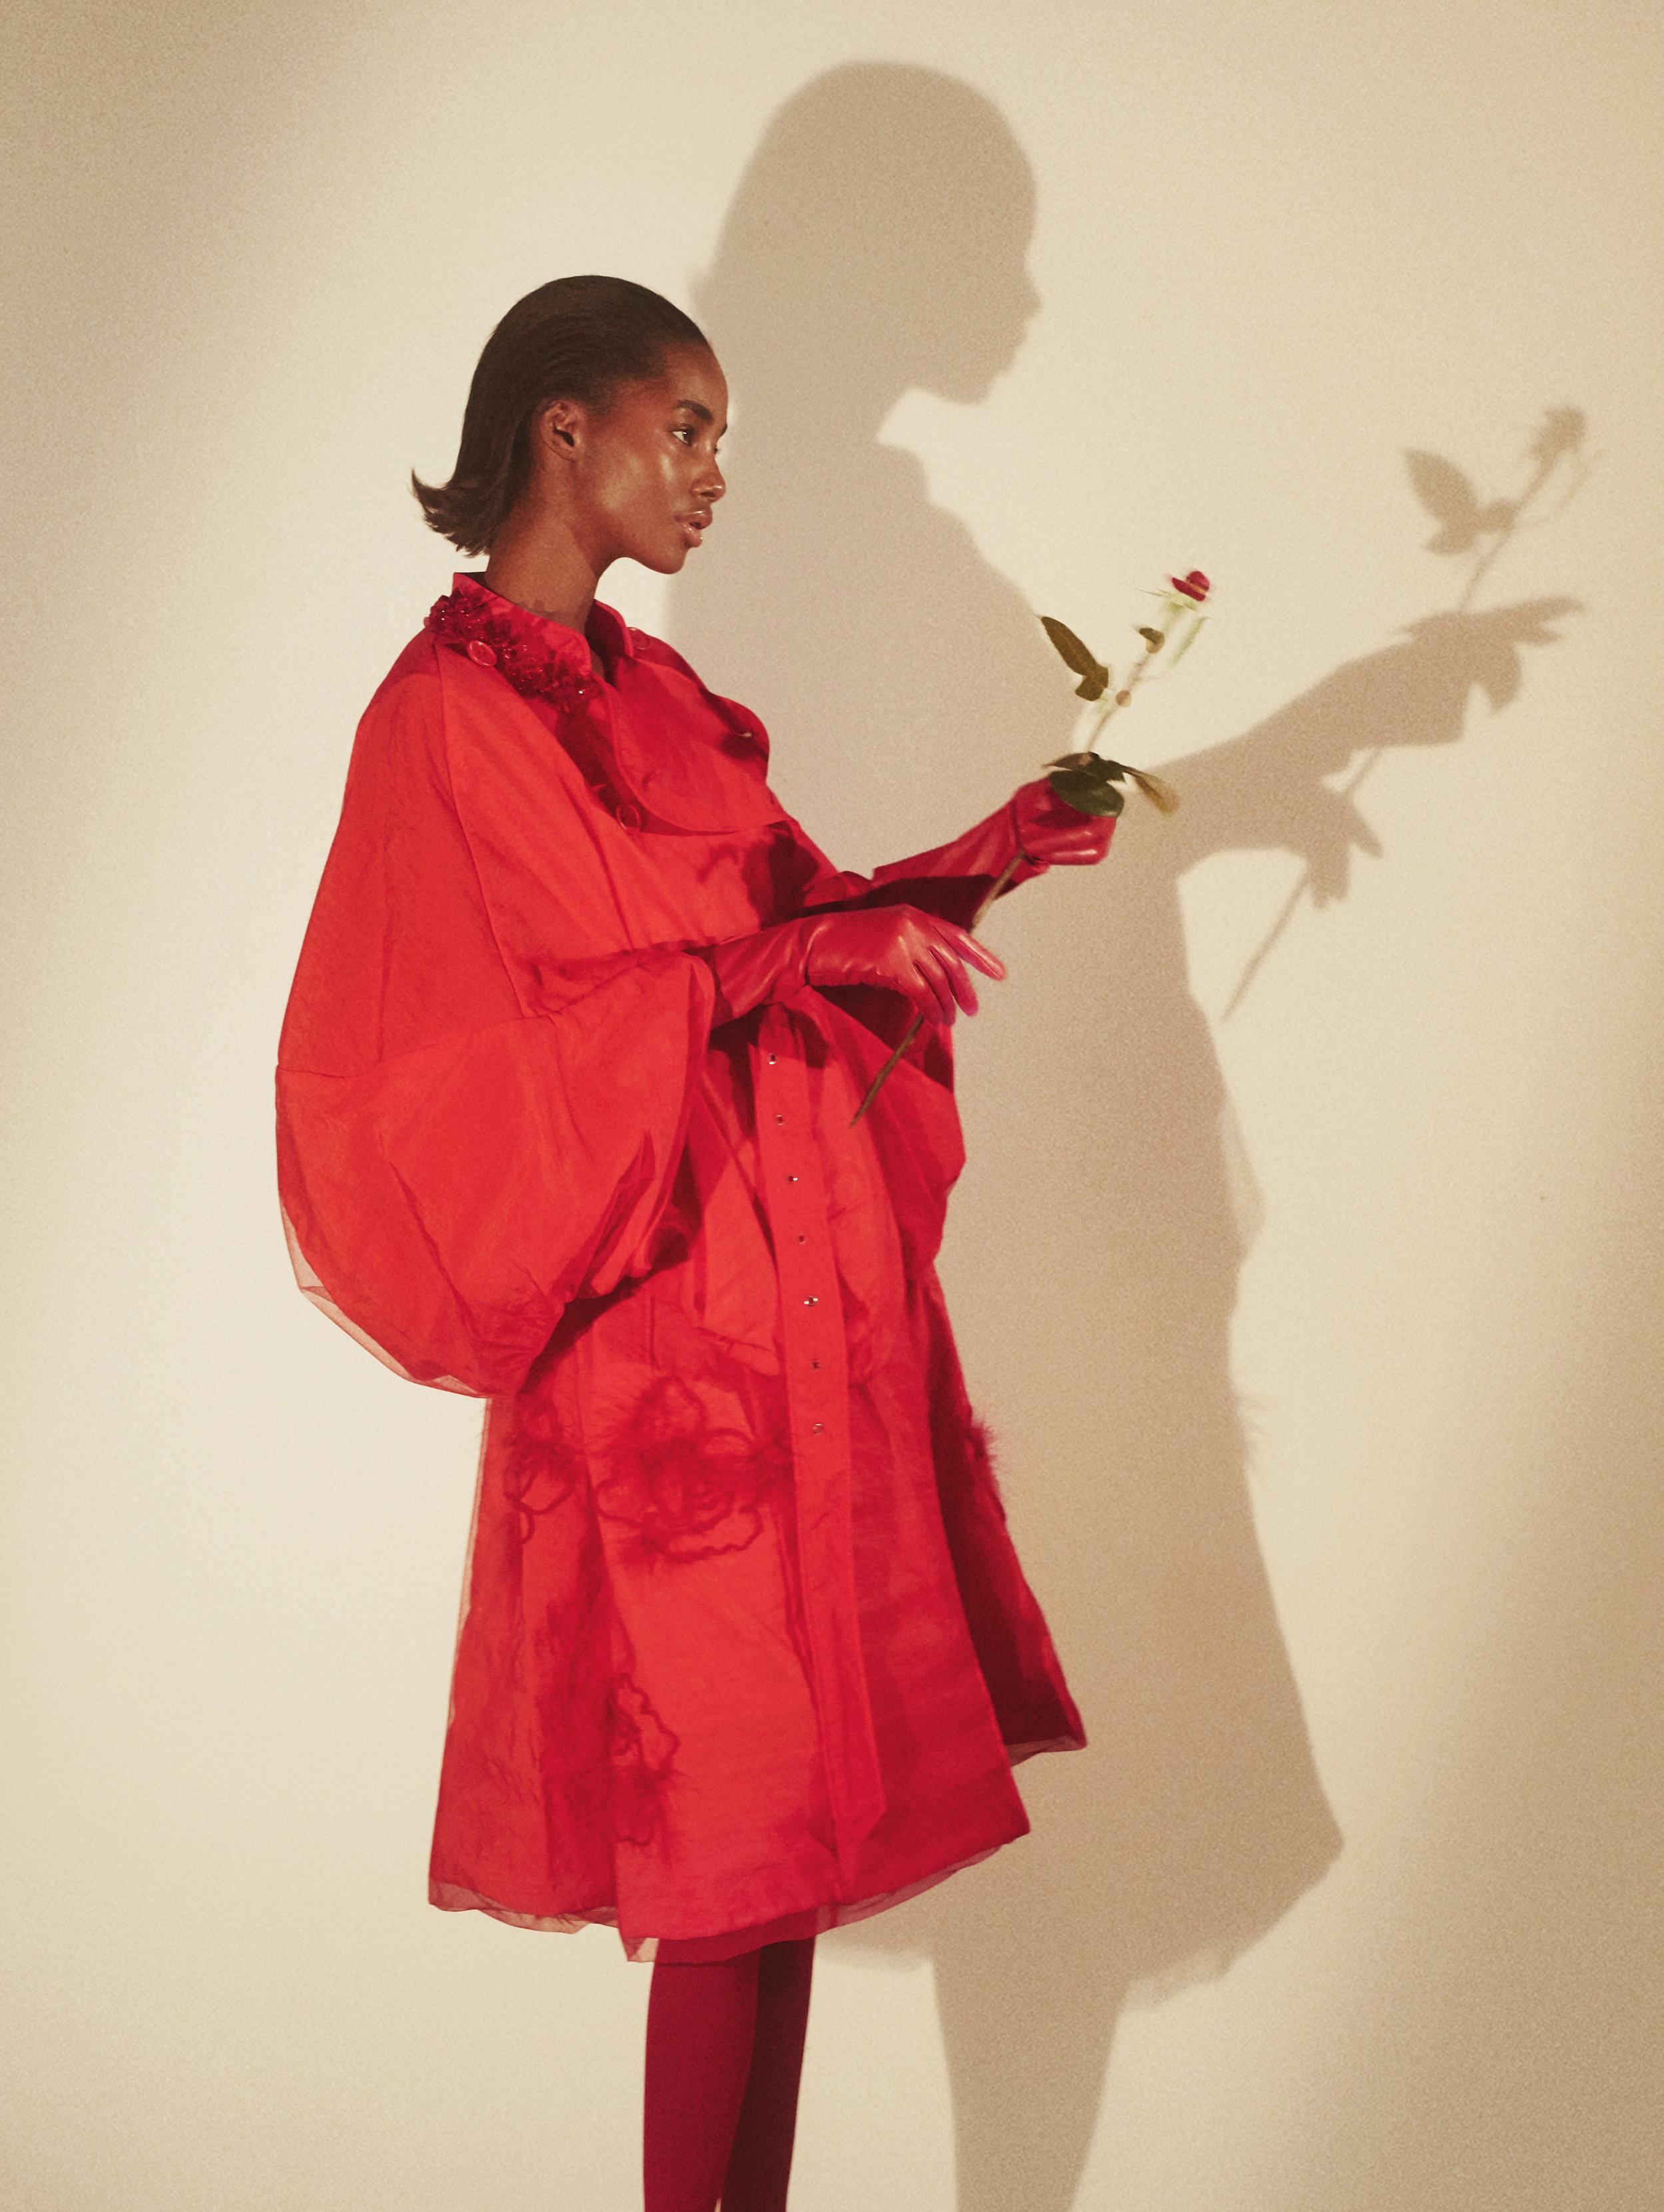 Tami Williams at The Society by Mikey Asanin